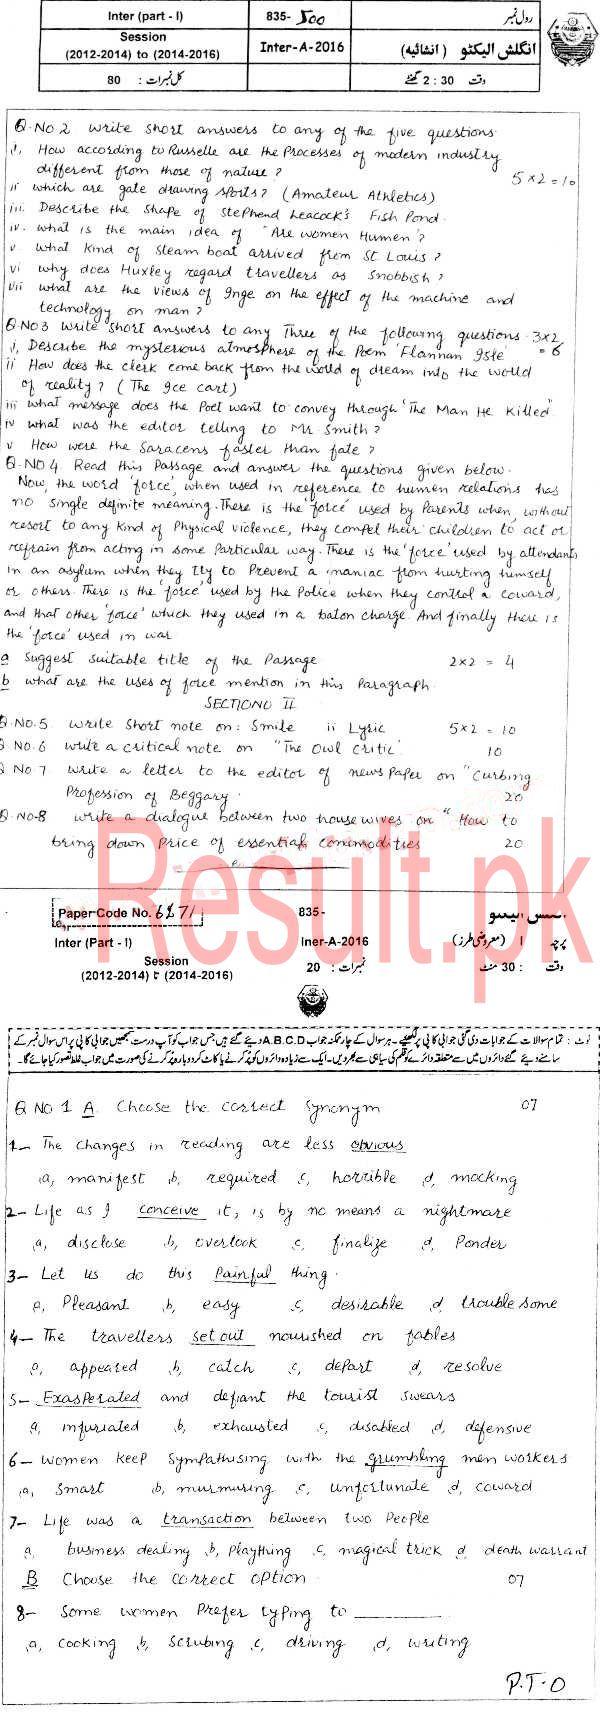 BISE Bahawalpur Board Past Papers 2019 Inter Part 1 2, FA